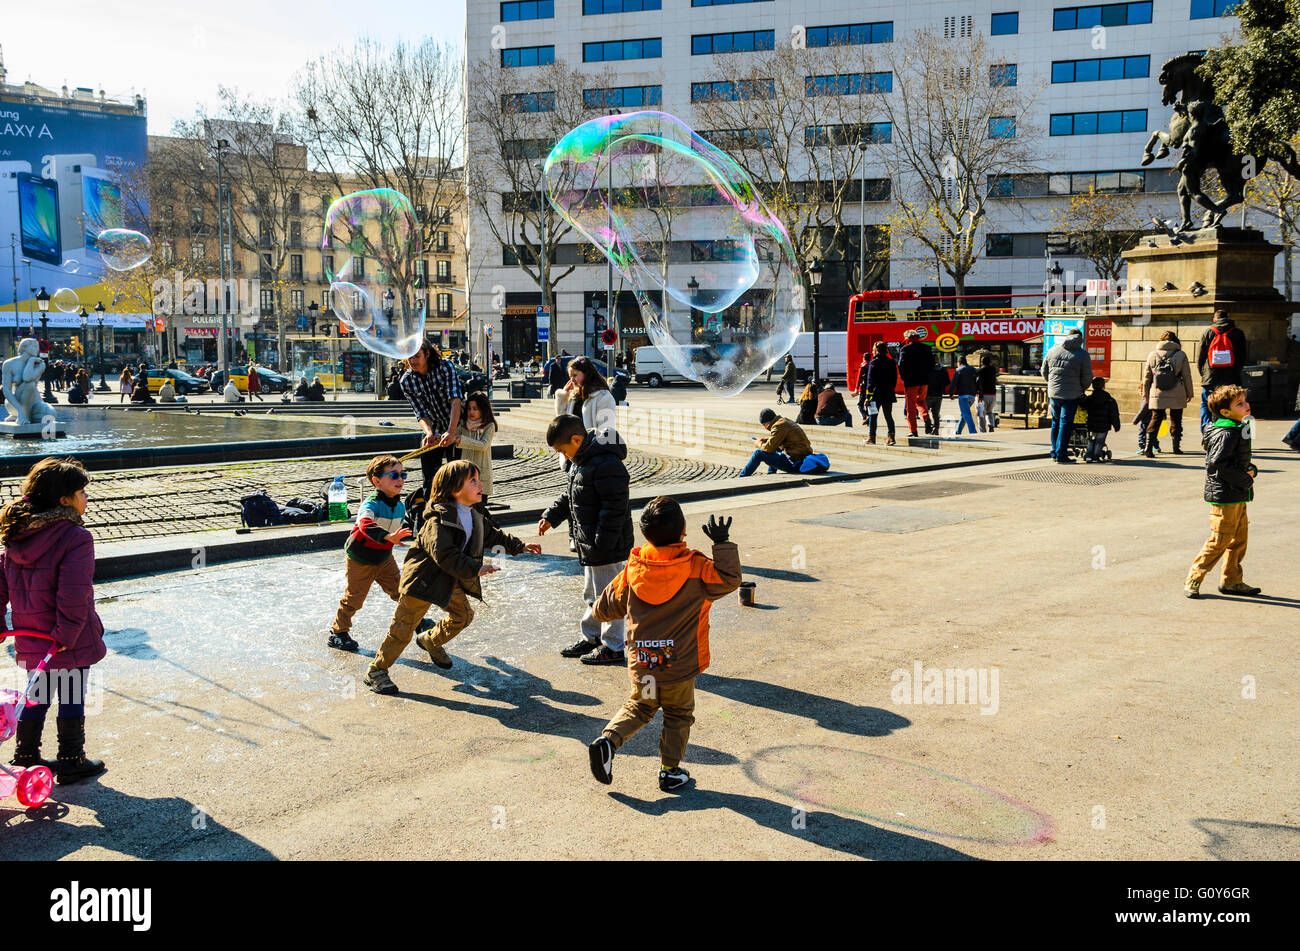 Street performers blow soap bubbles in Plaça de Catalunya Barcelona Catalonia Spain - Stock Image